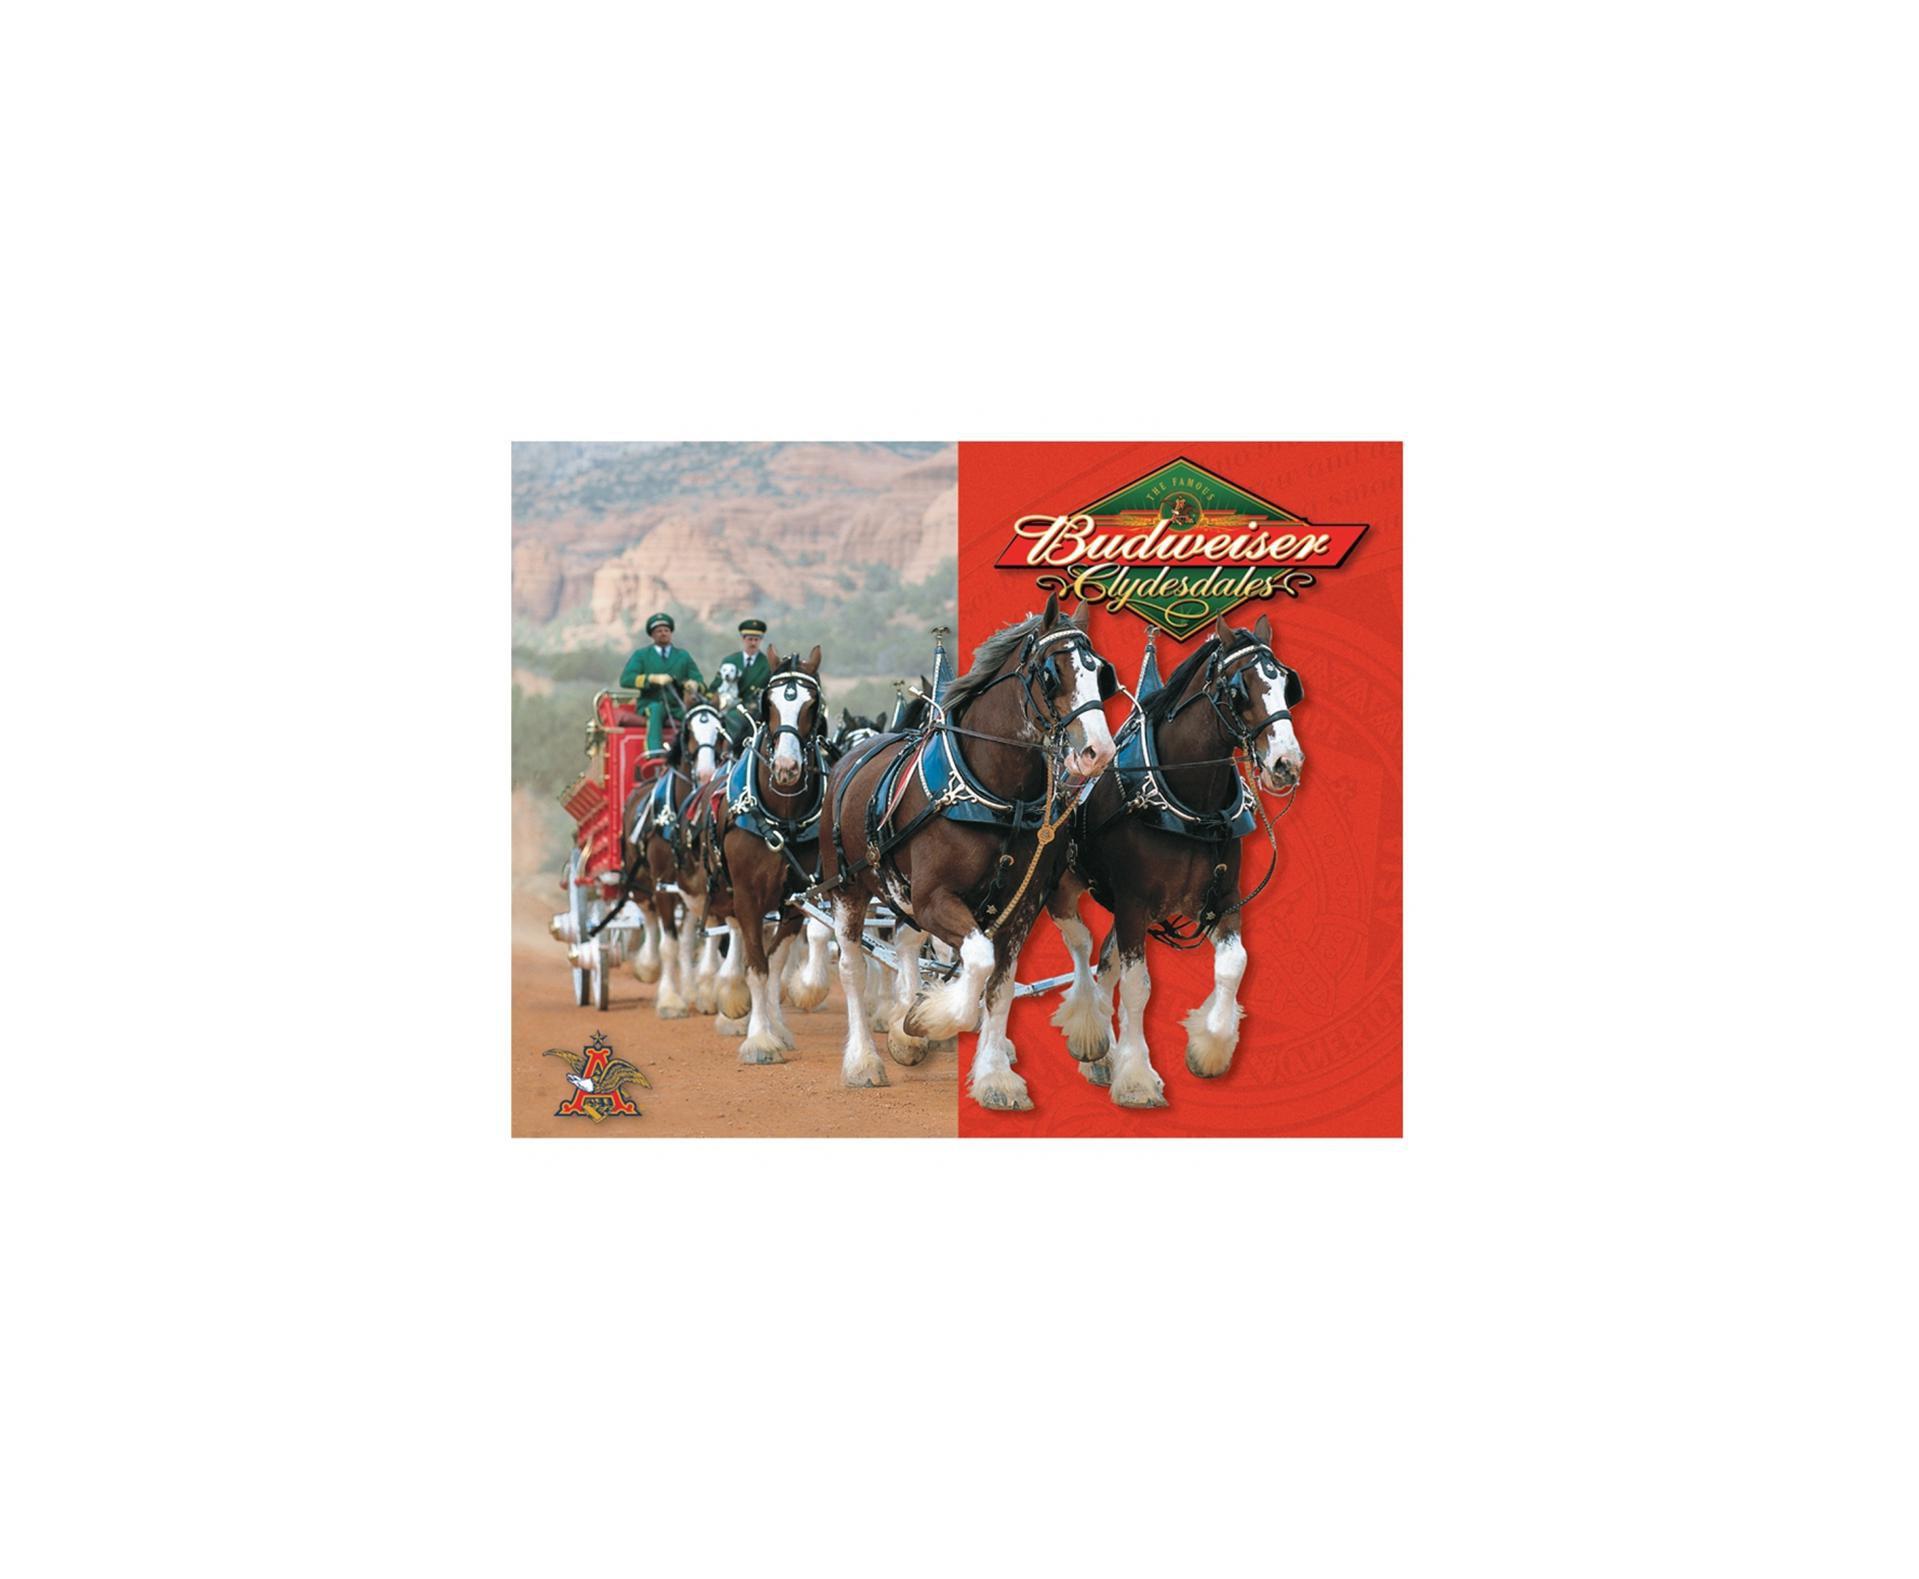 Placa Metálica Decorativa Budweiser Horse - Rossi